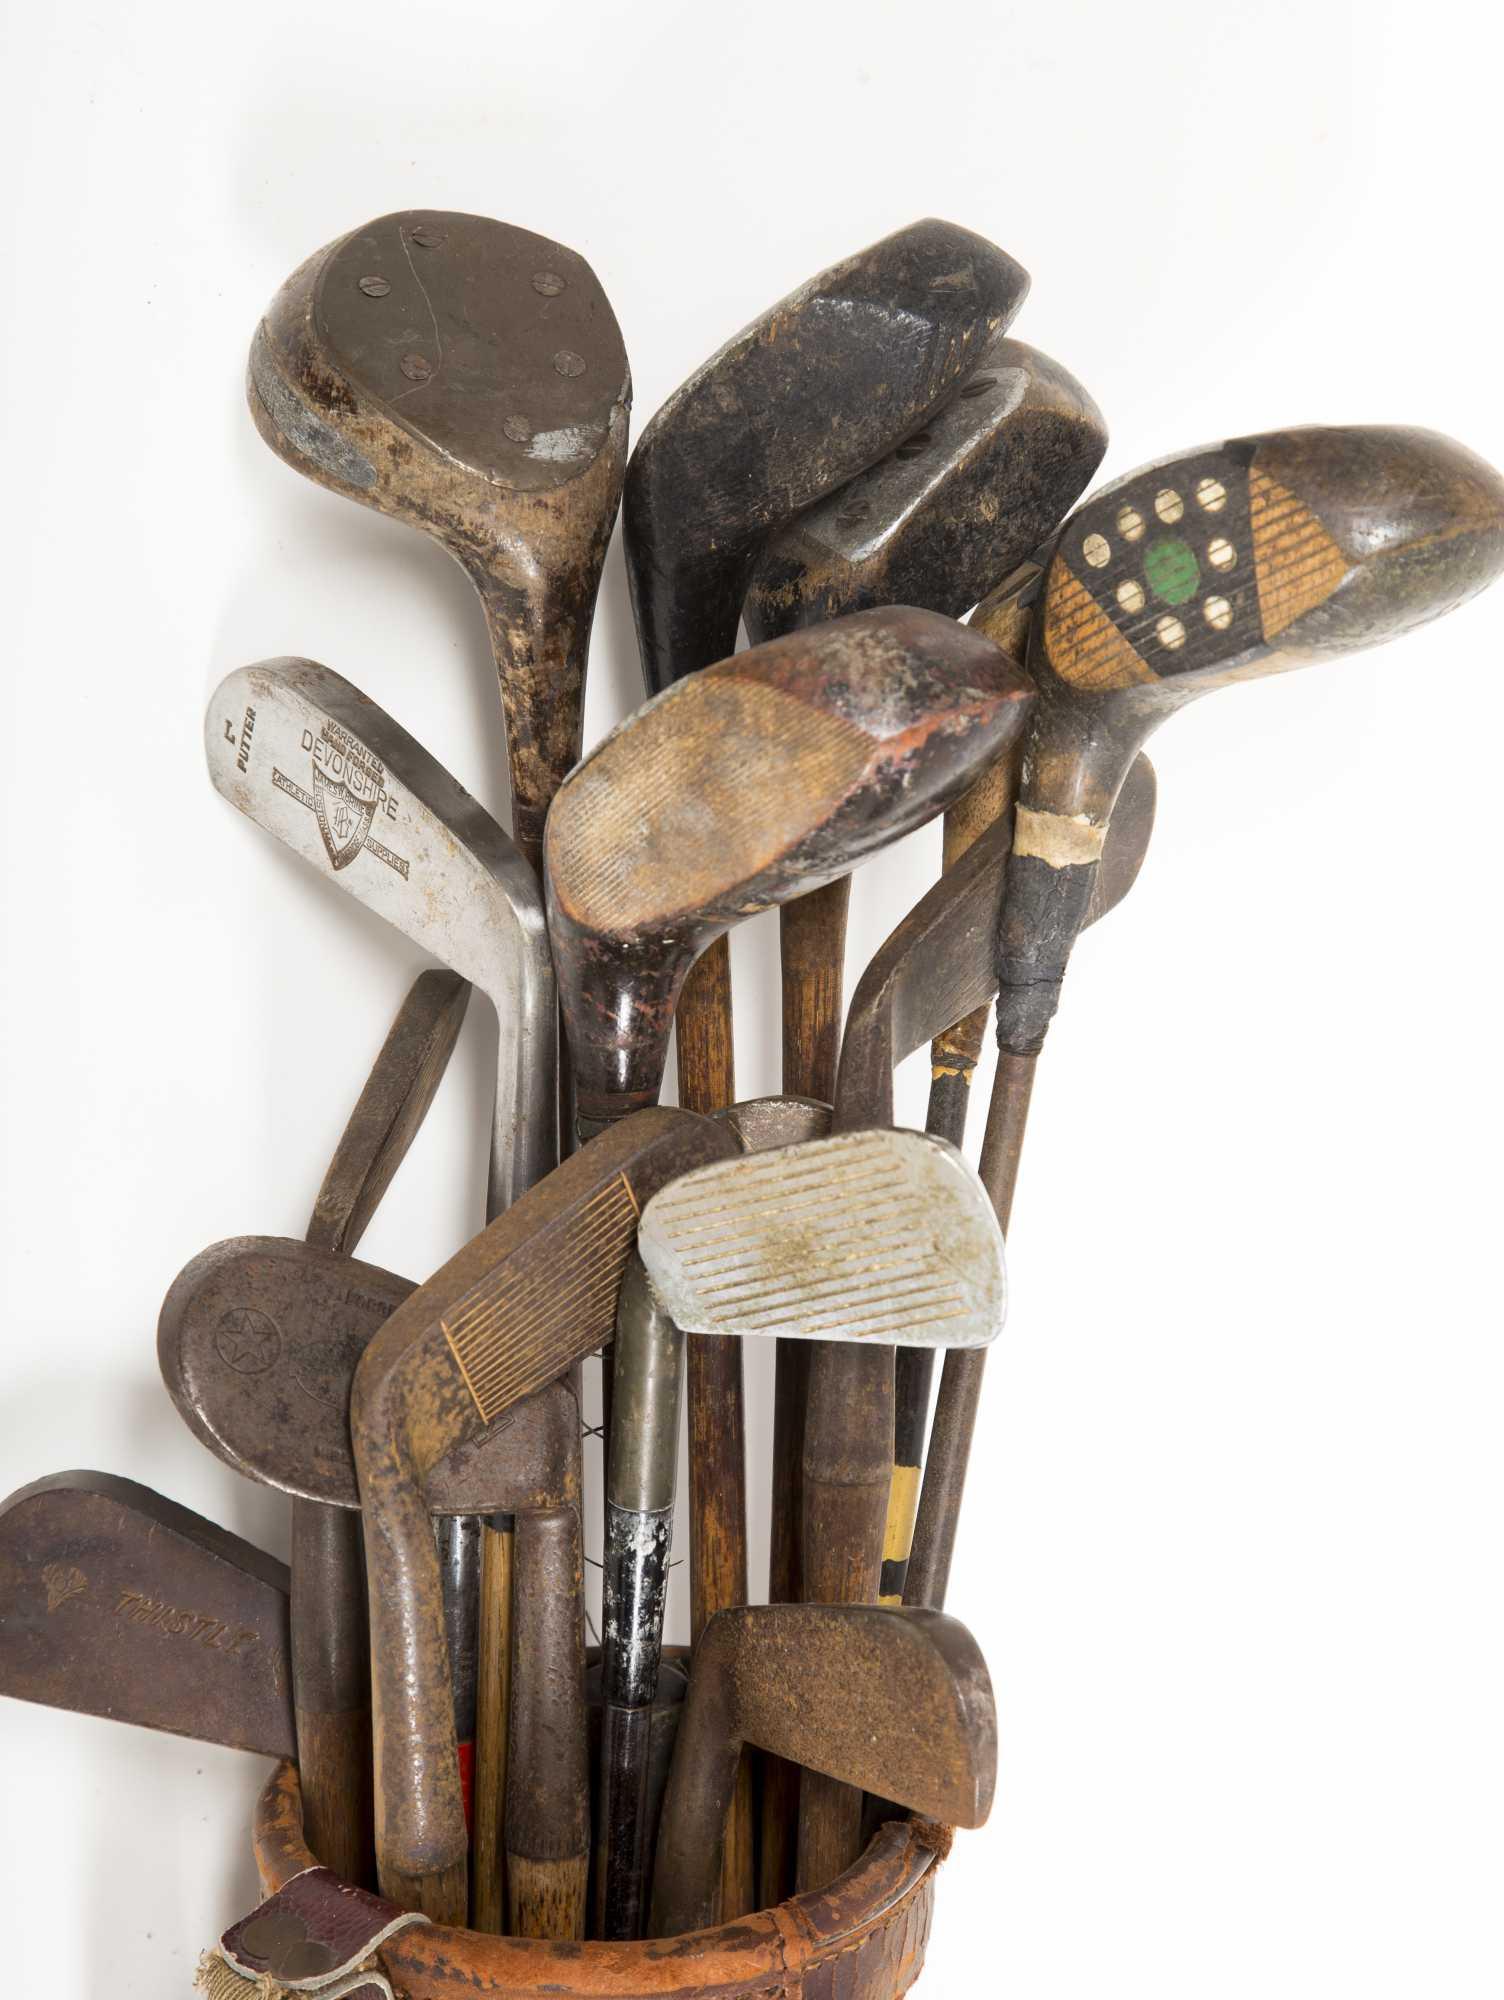 Golfbuybackprogram.jpg